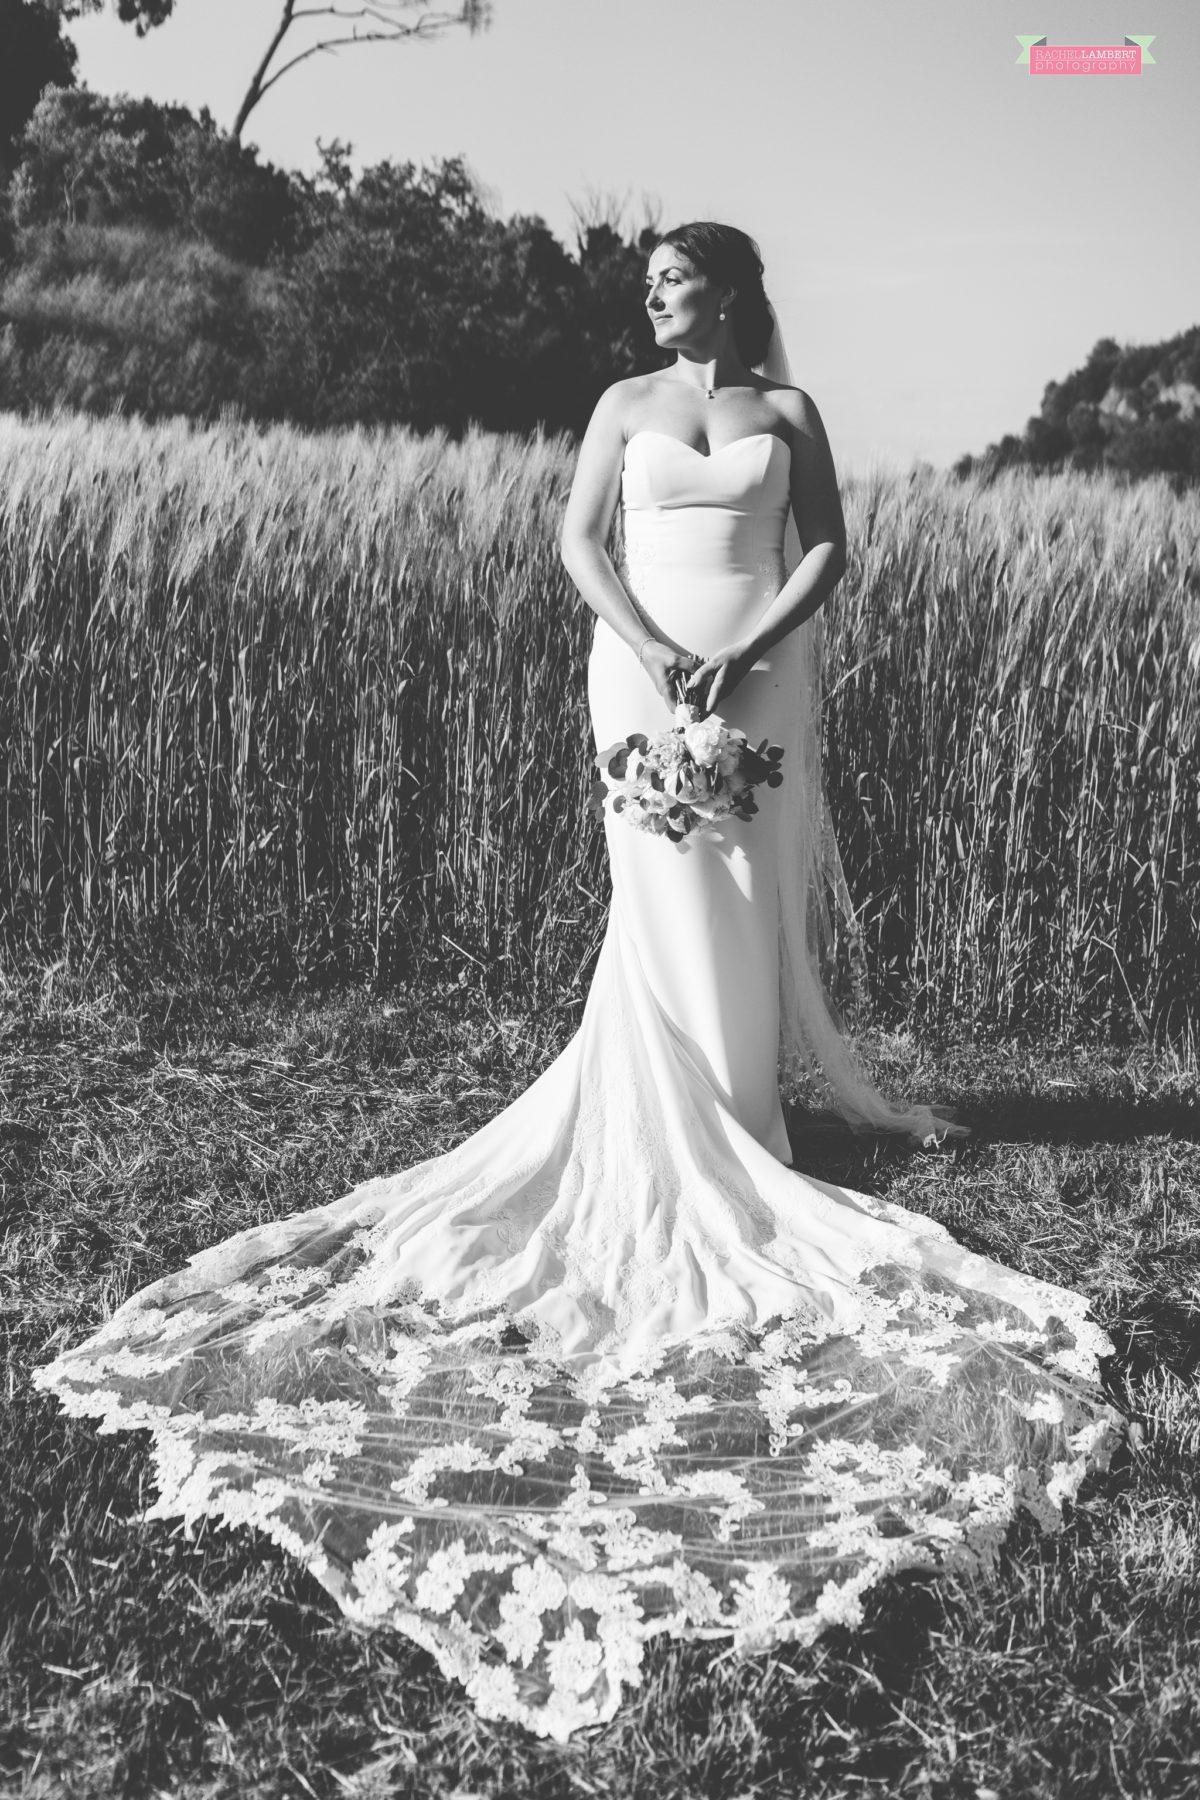 rachel lambert photography destination wedding photographer Borgo di Tragliata rome italy bride black and white